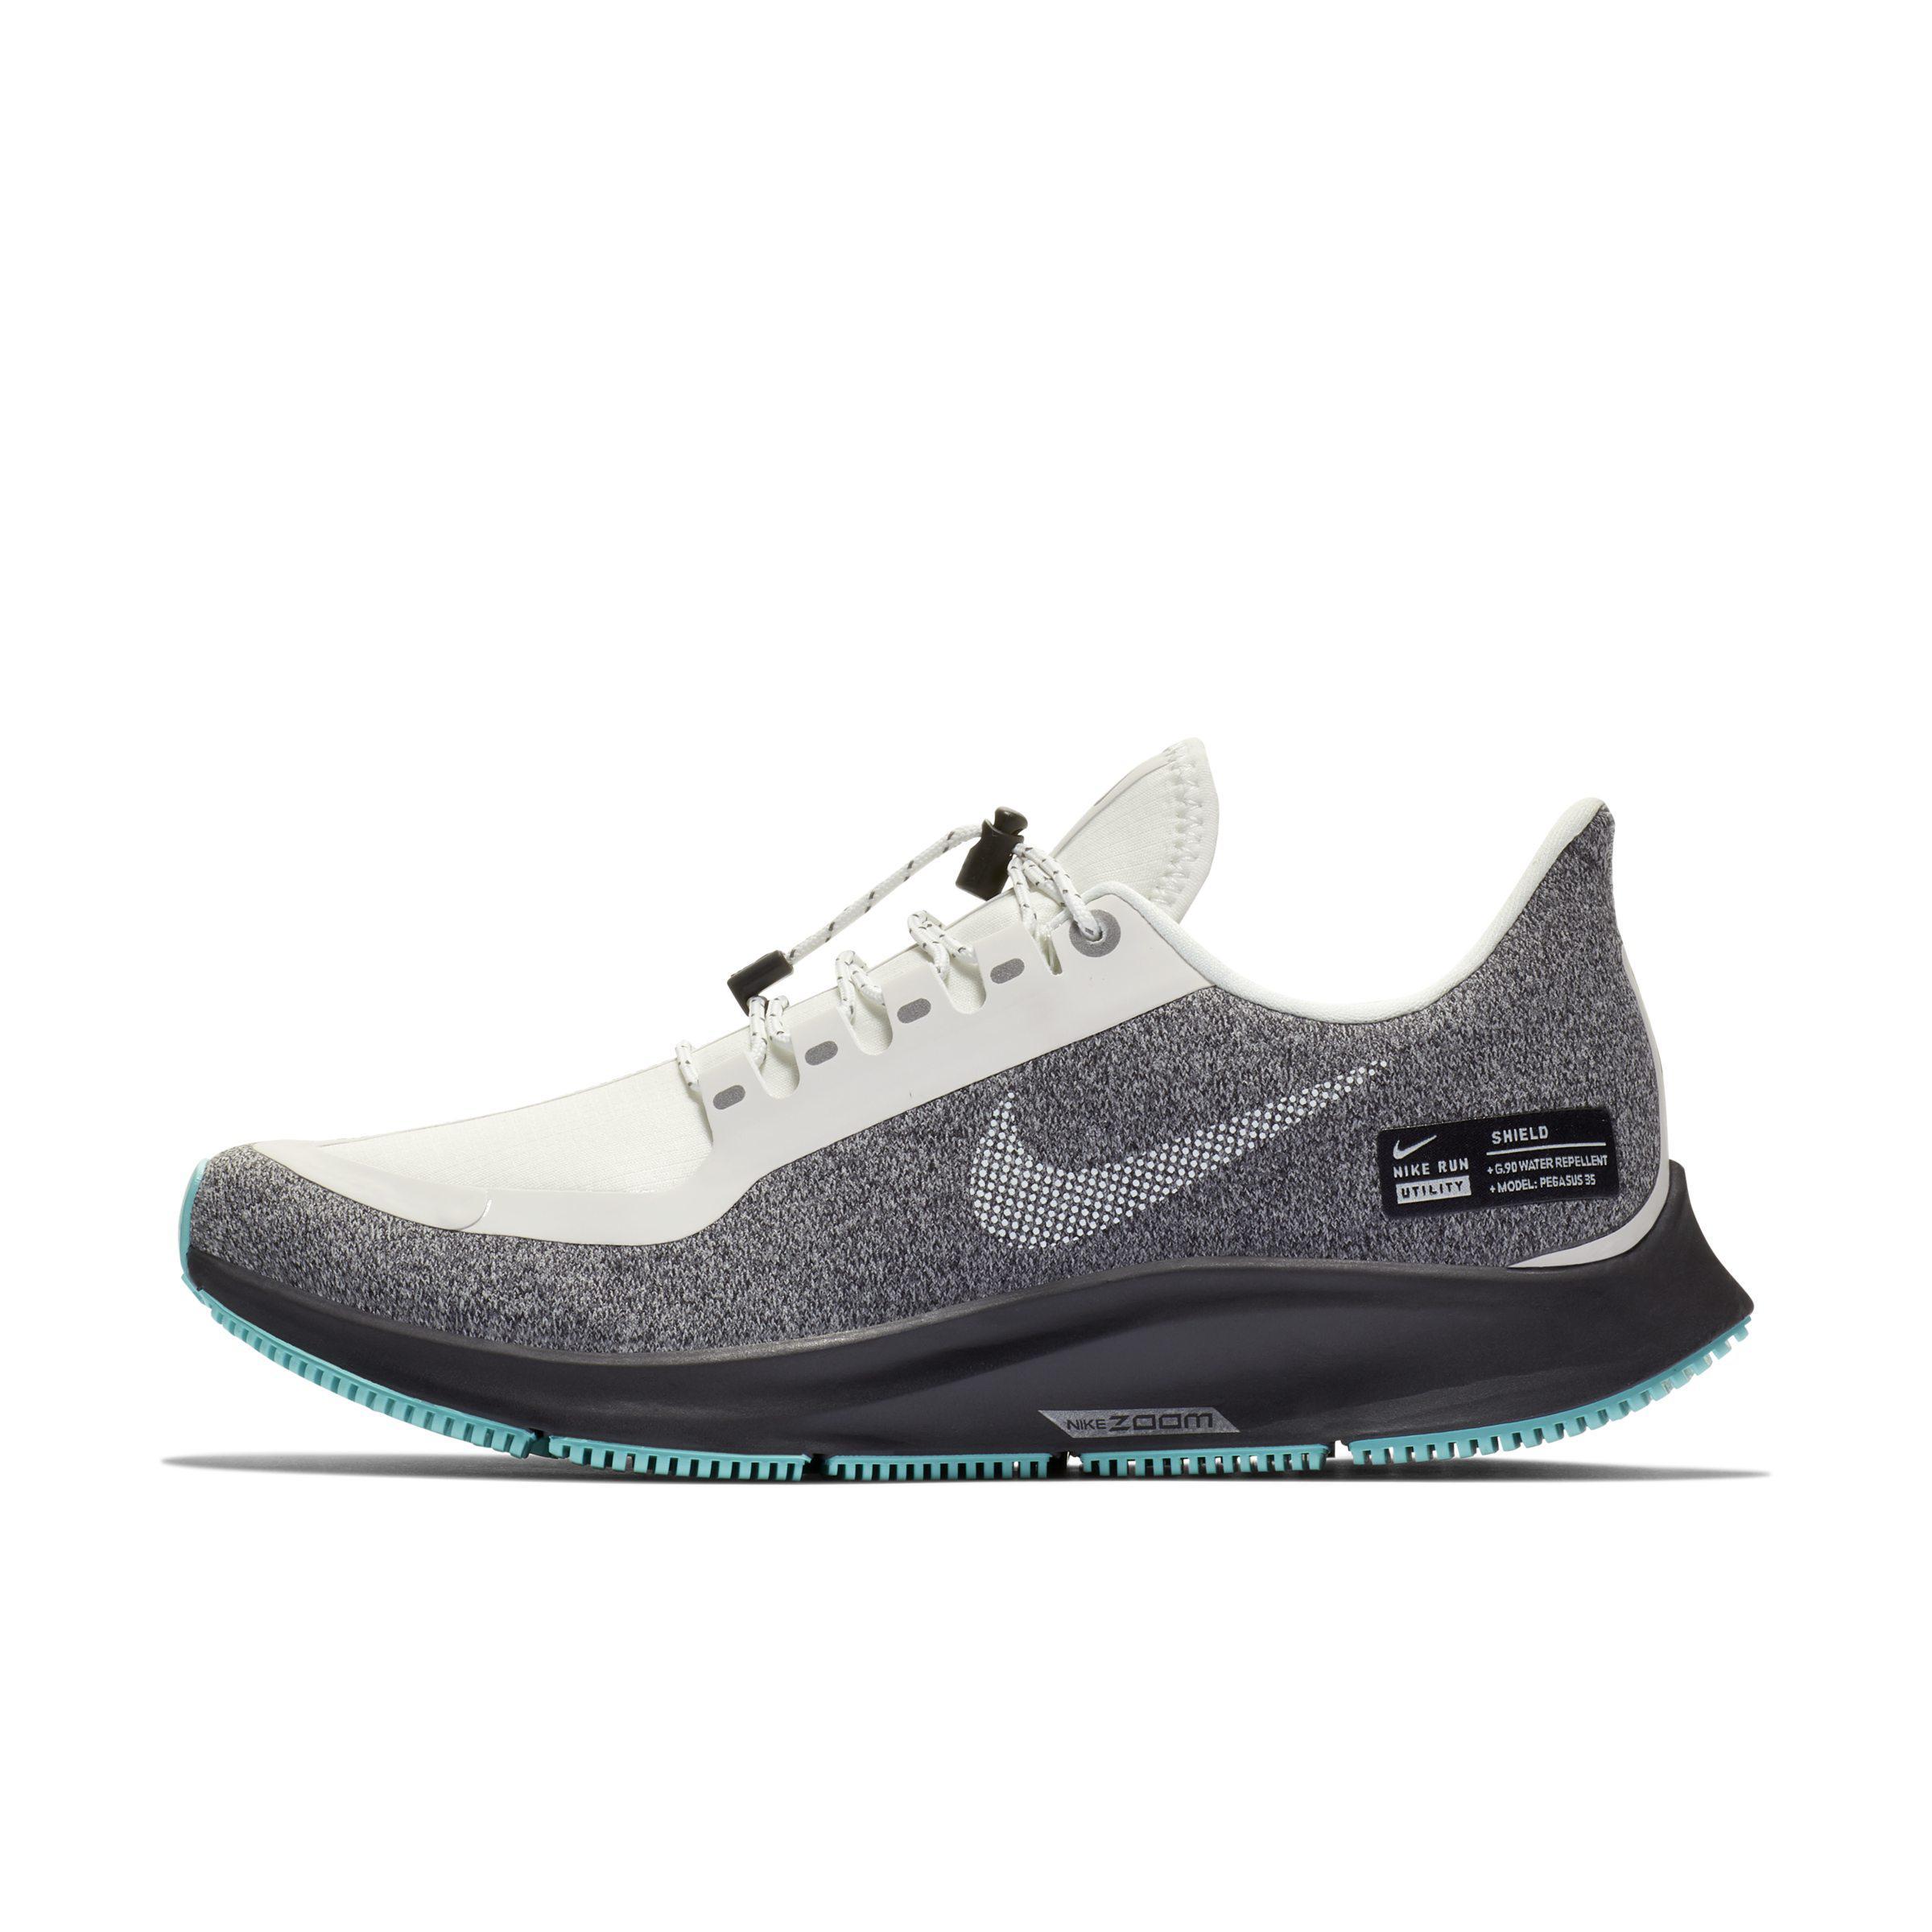 best sneakers 7761d 2cb50 Nike Air Zoom Pegasus 35 Shield Water-repellent Running Shoe in ...